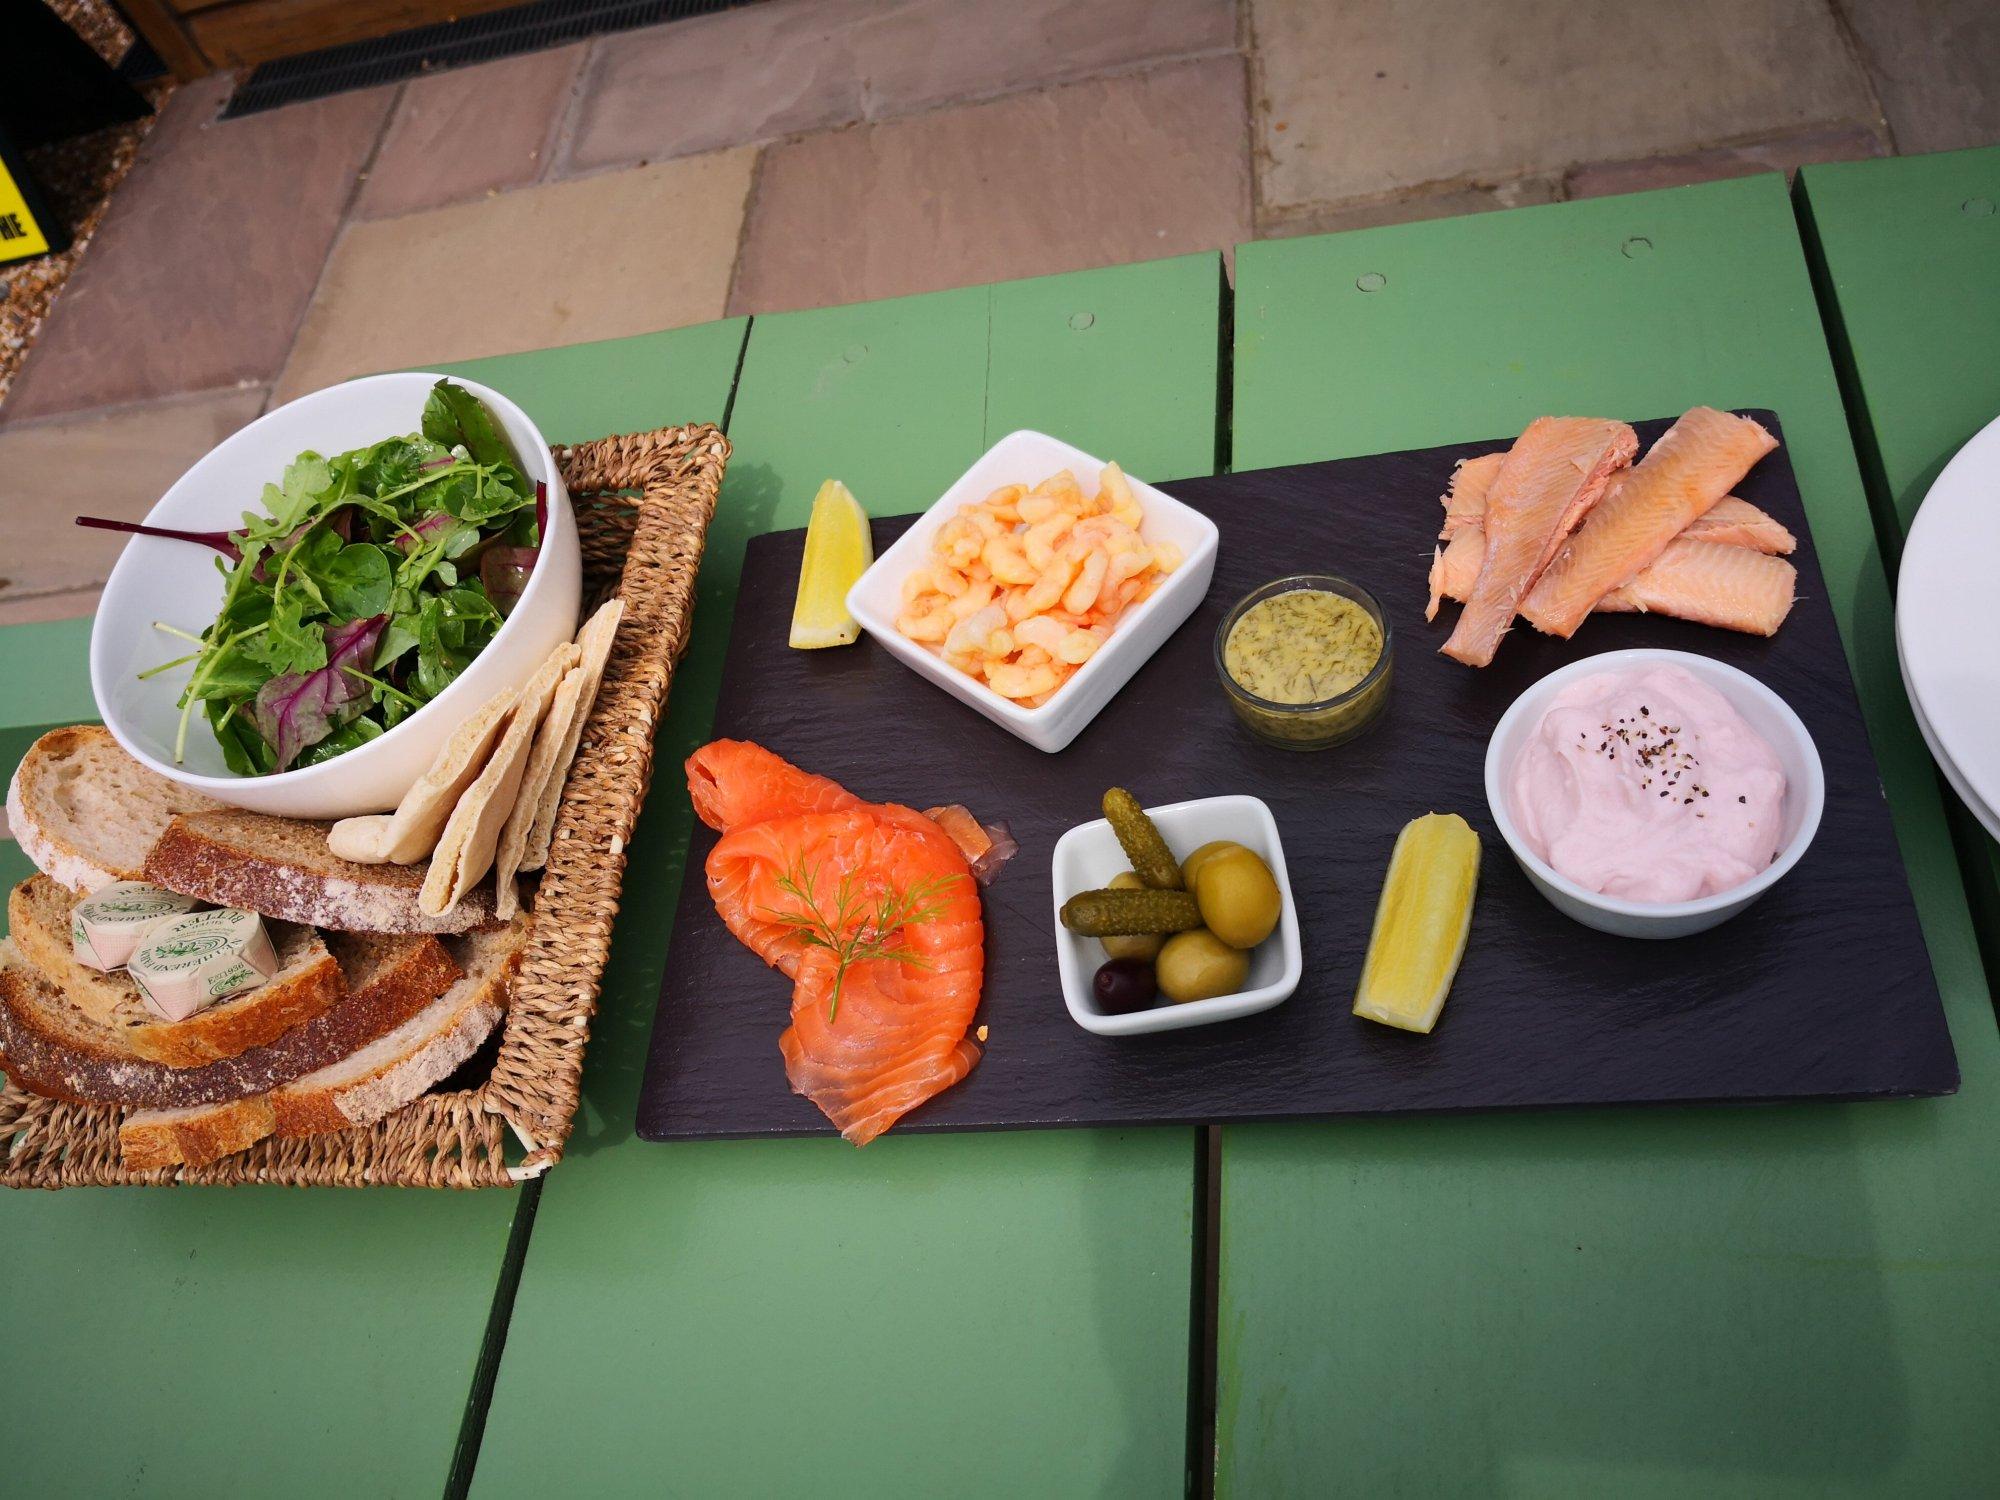 Weld Smokery - A Fish Sharing Platter - Great food!!